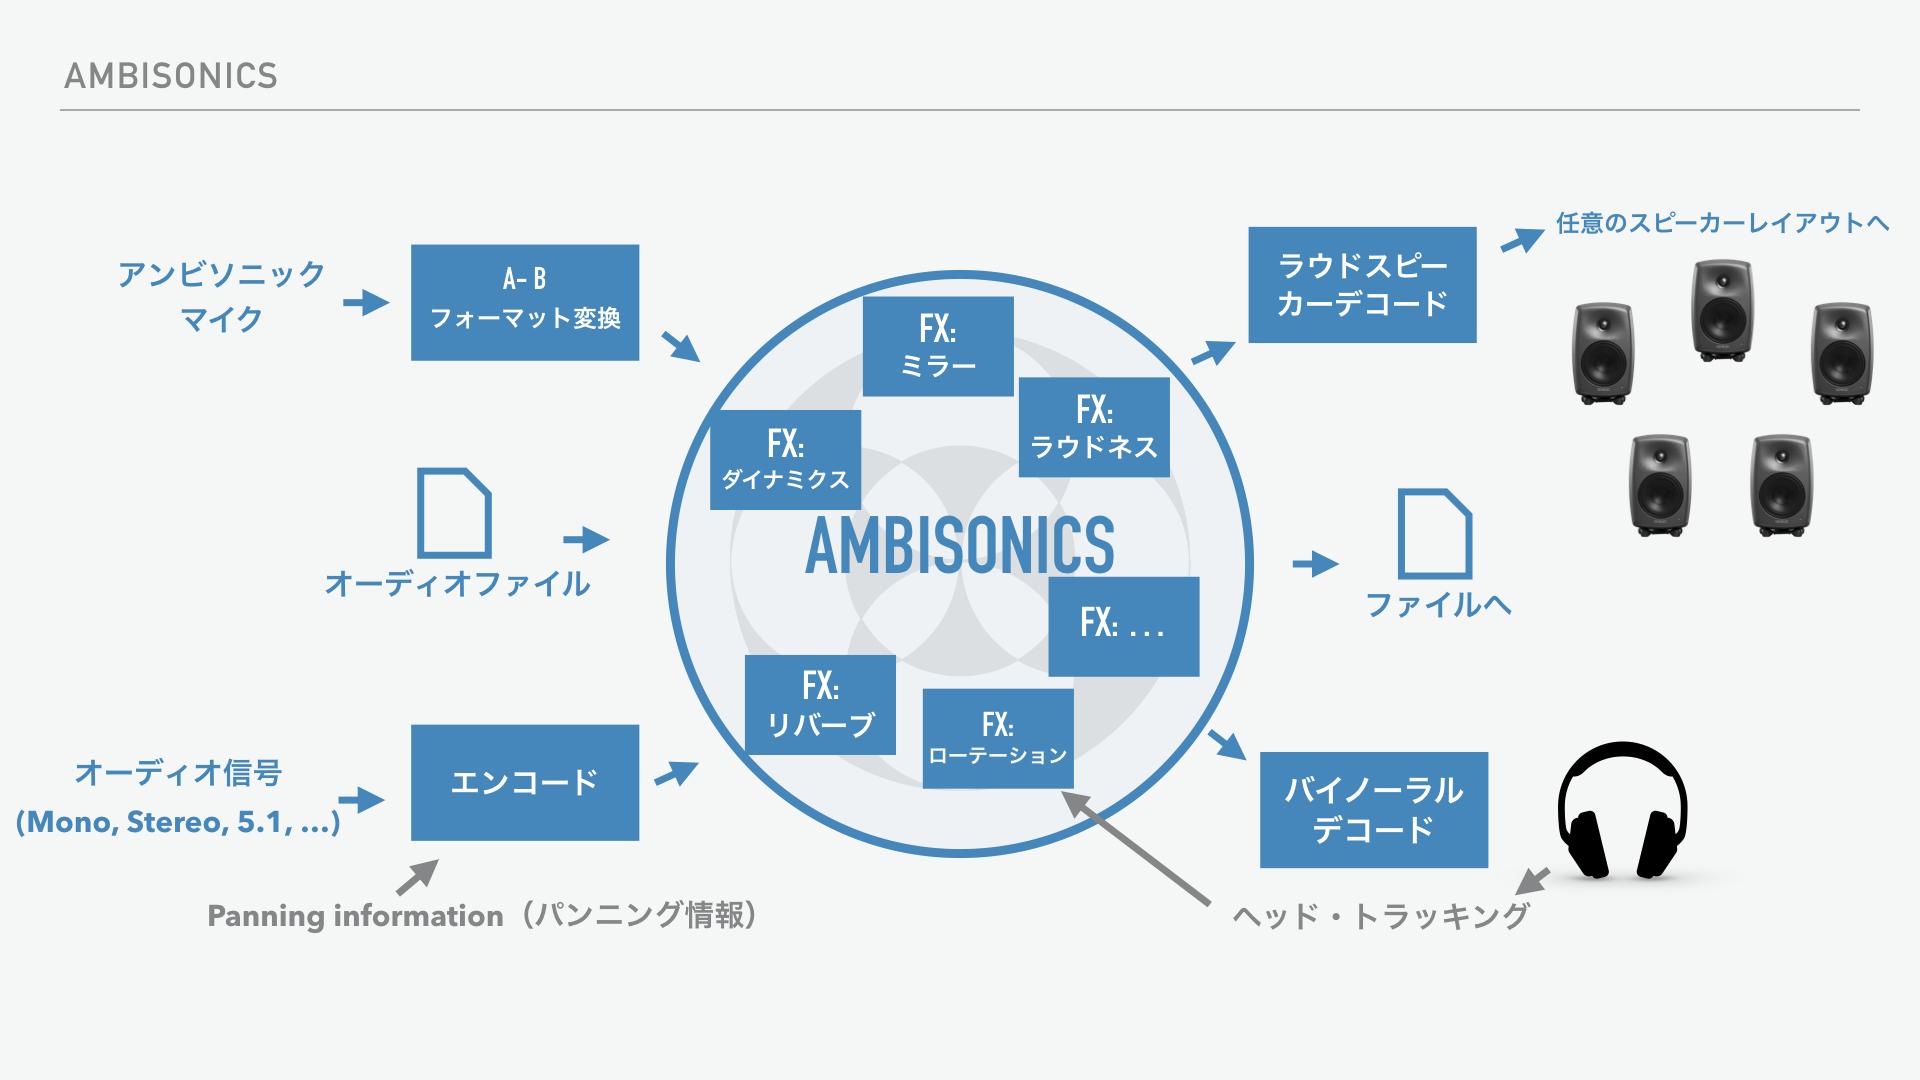 IEM Plug-in Suite ワークショップ : アンビソニックスの録音と再生